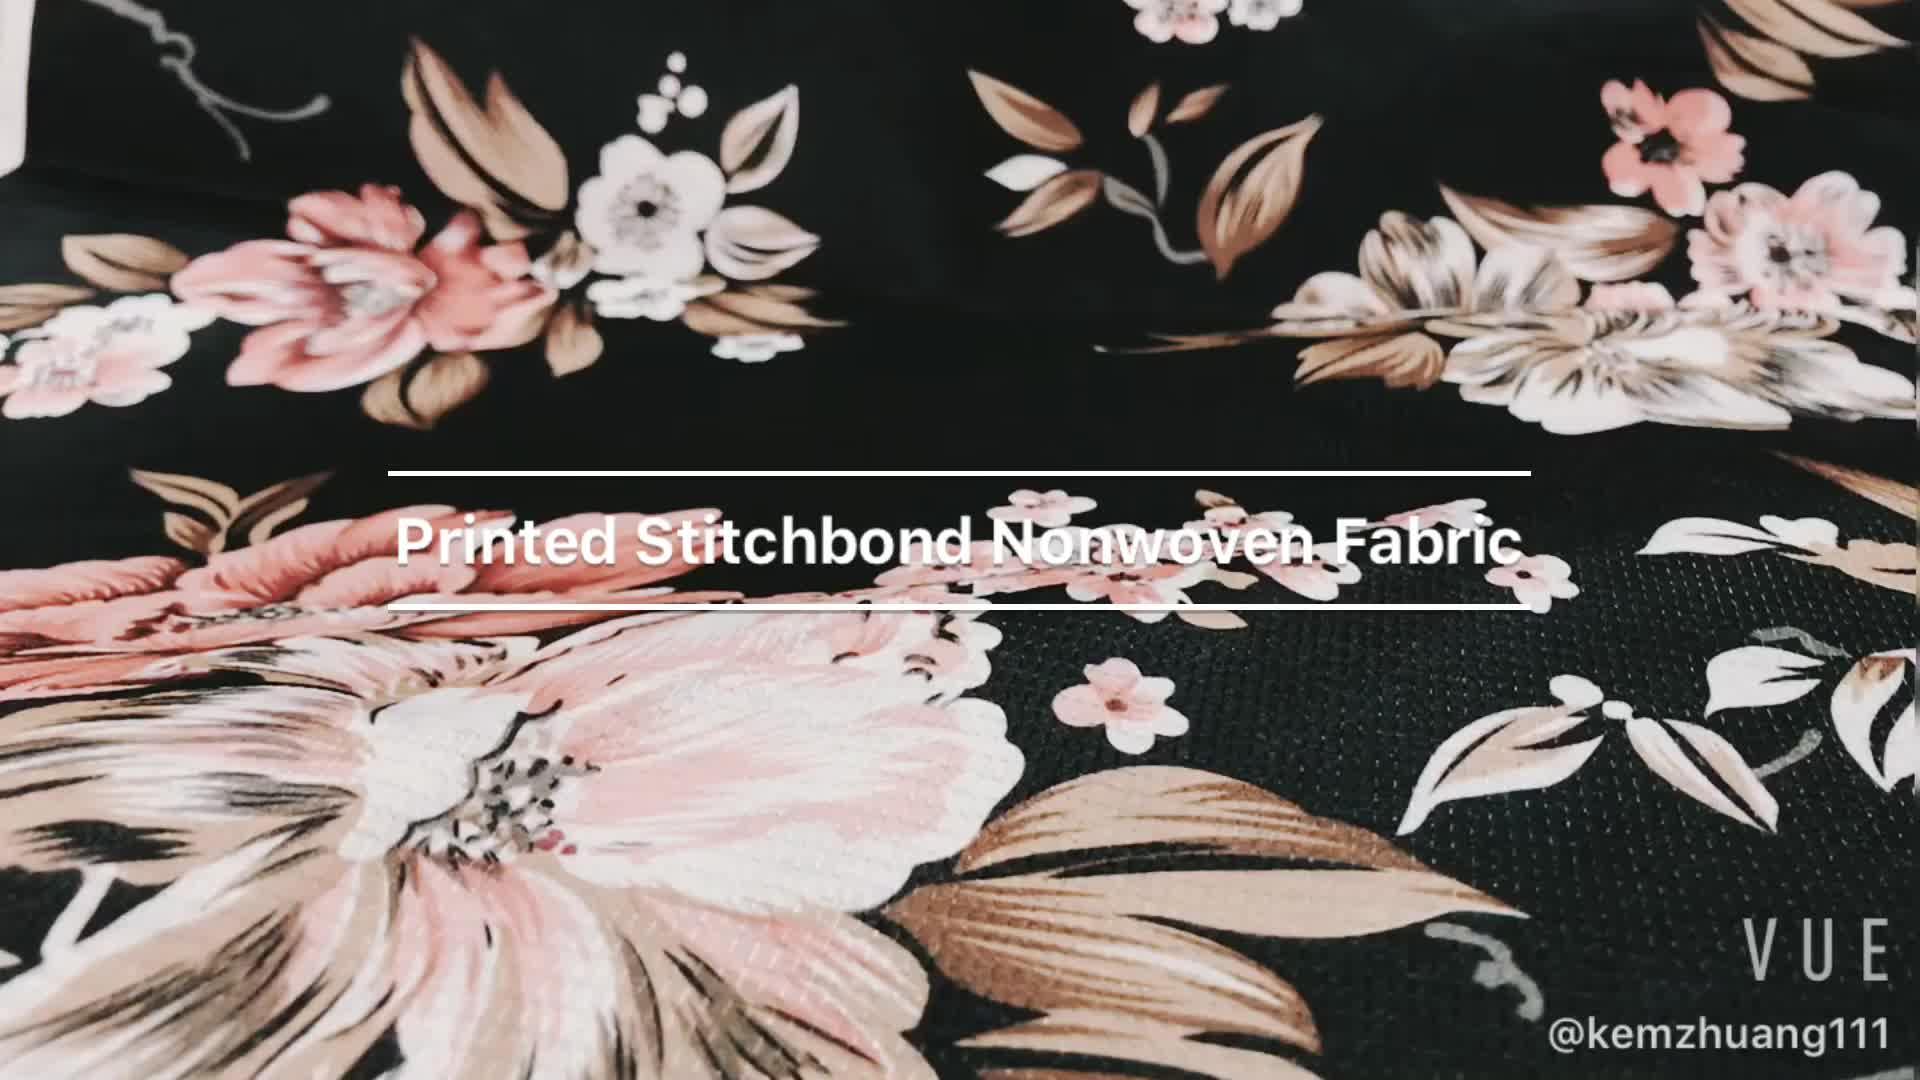 100% Stitch Bonding Geweven Stof, matras Recycle Pet Polyester Geweven Stof